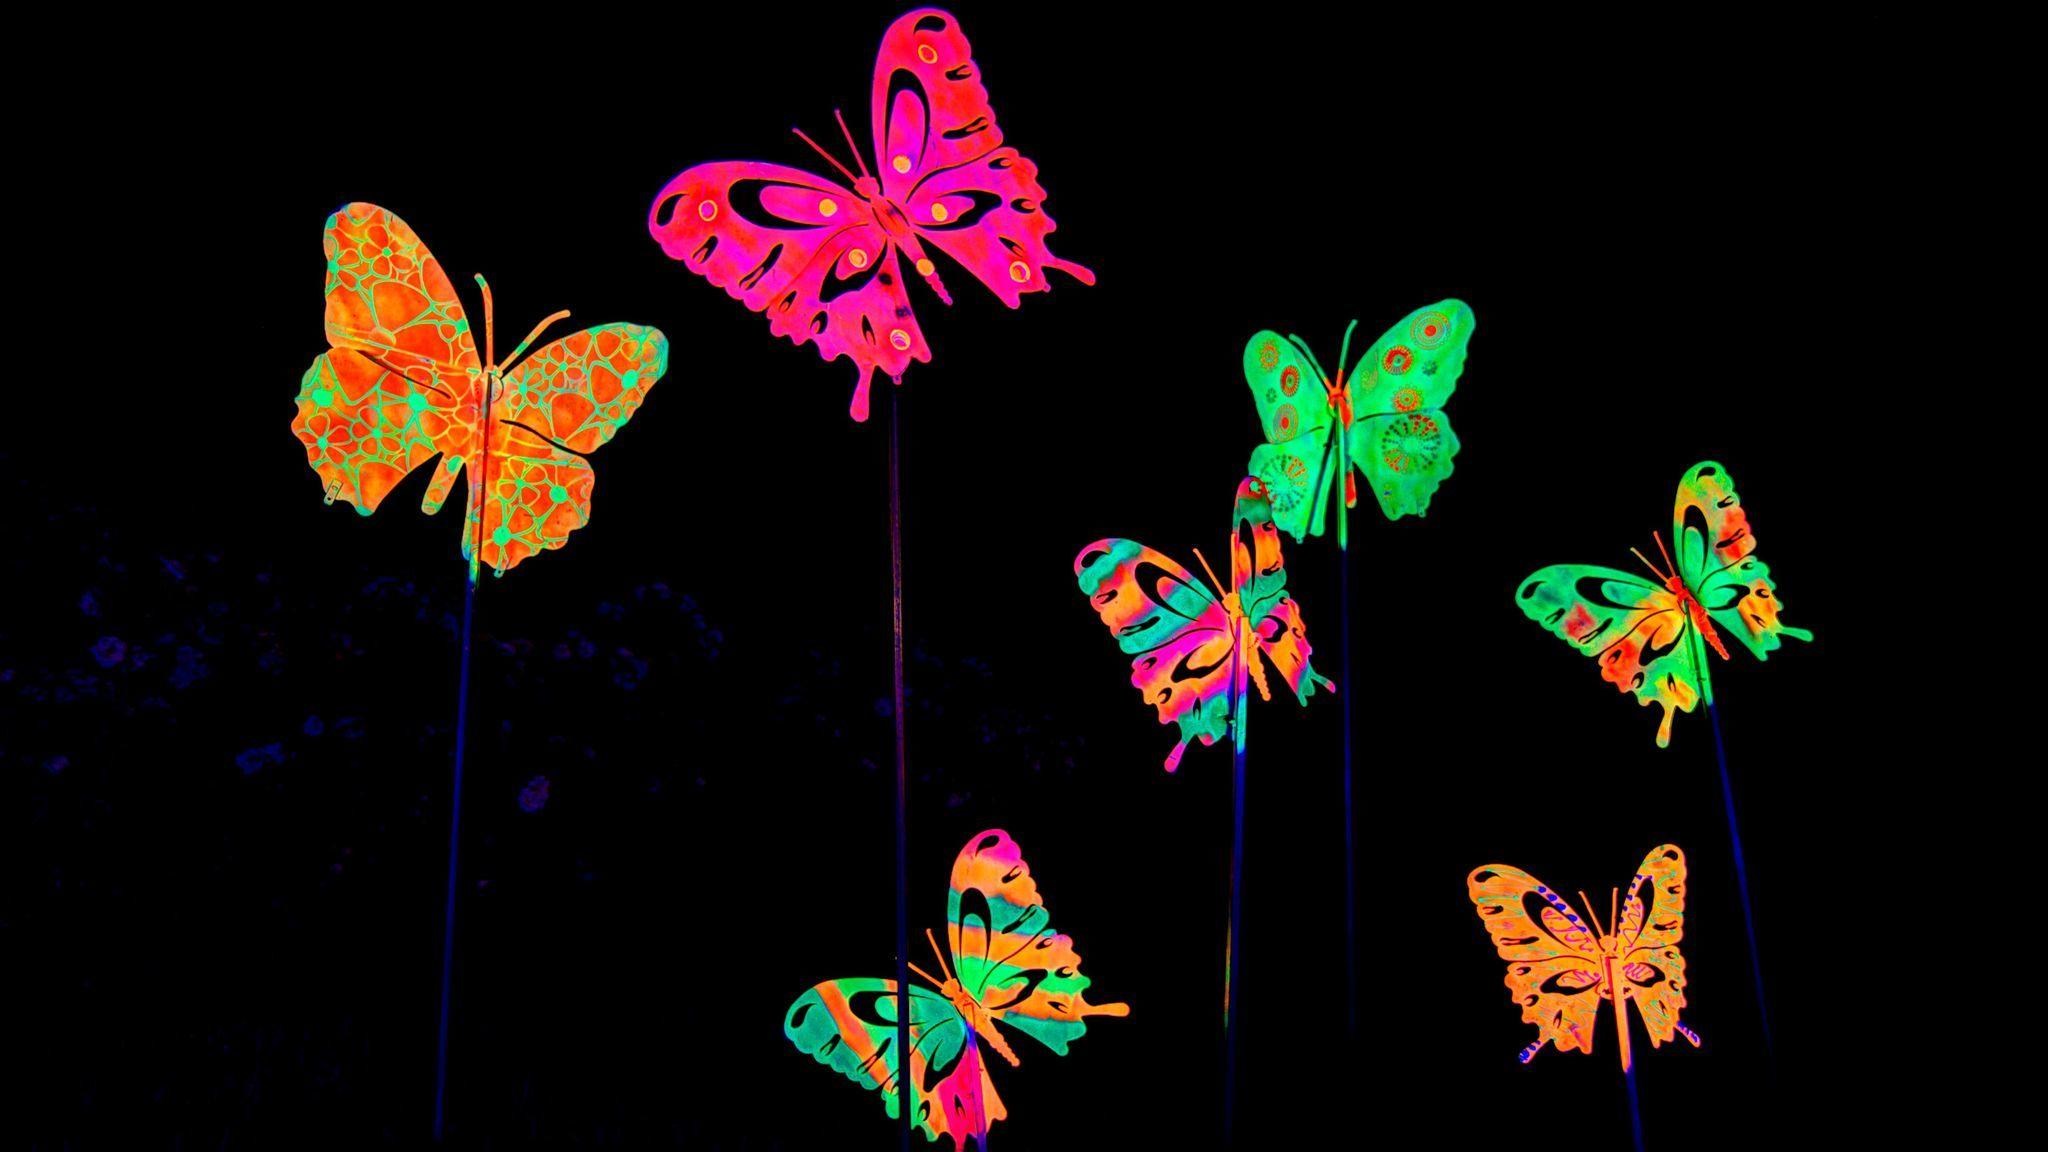 A close up of the butterflies